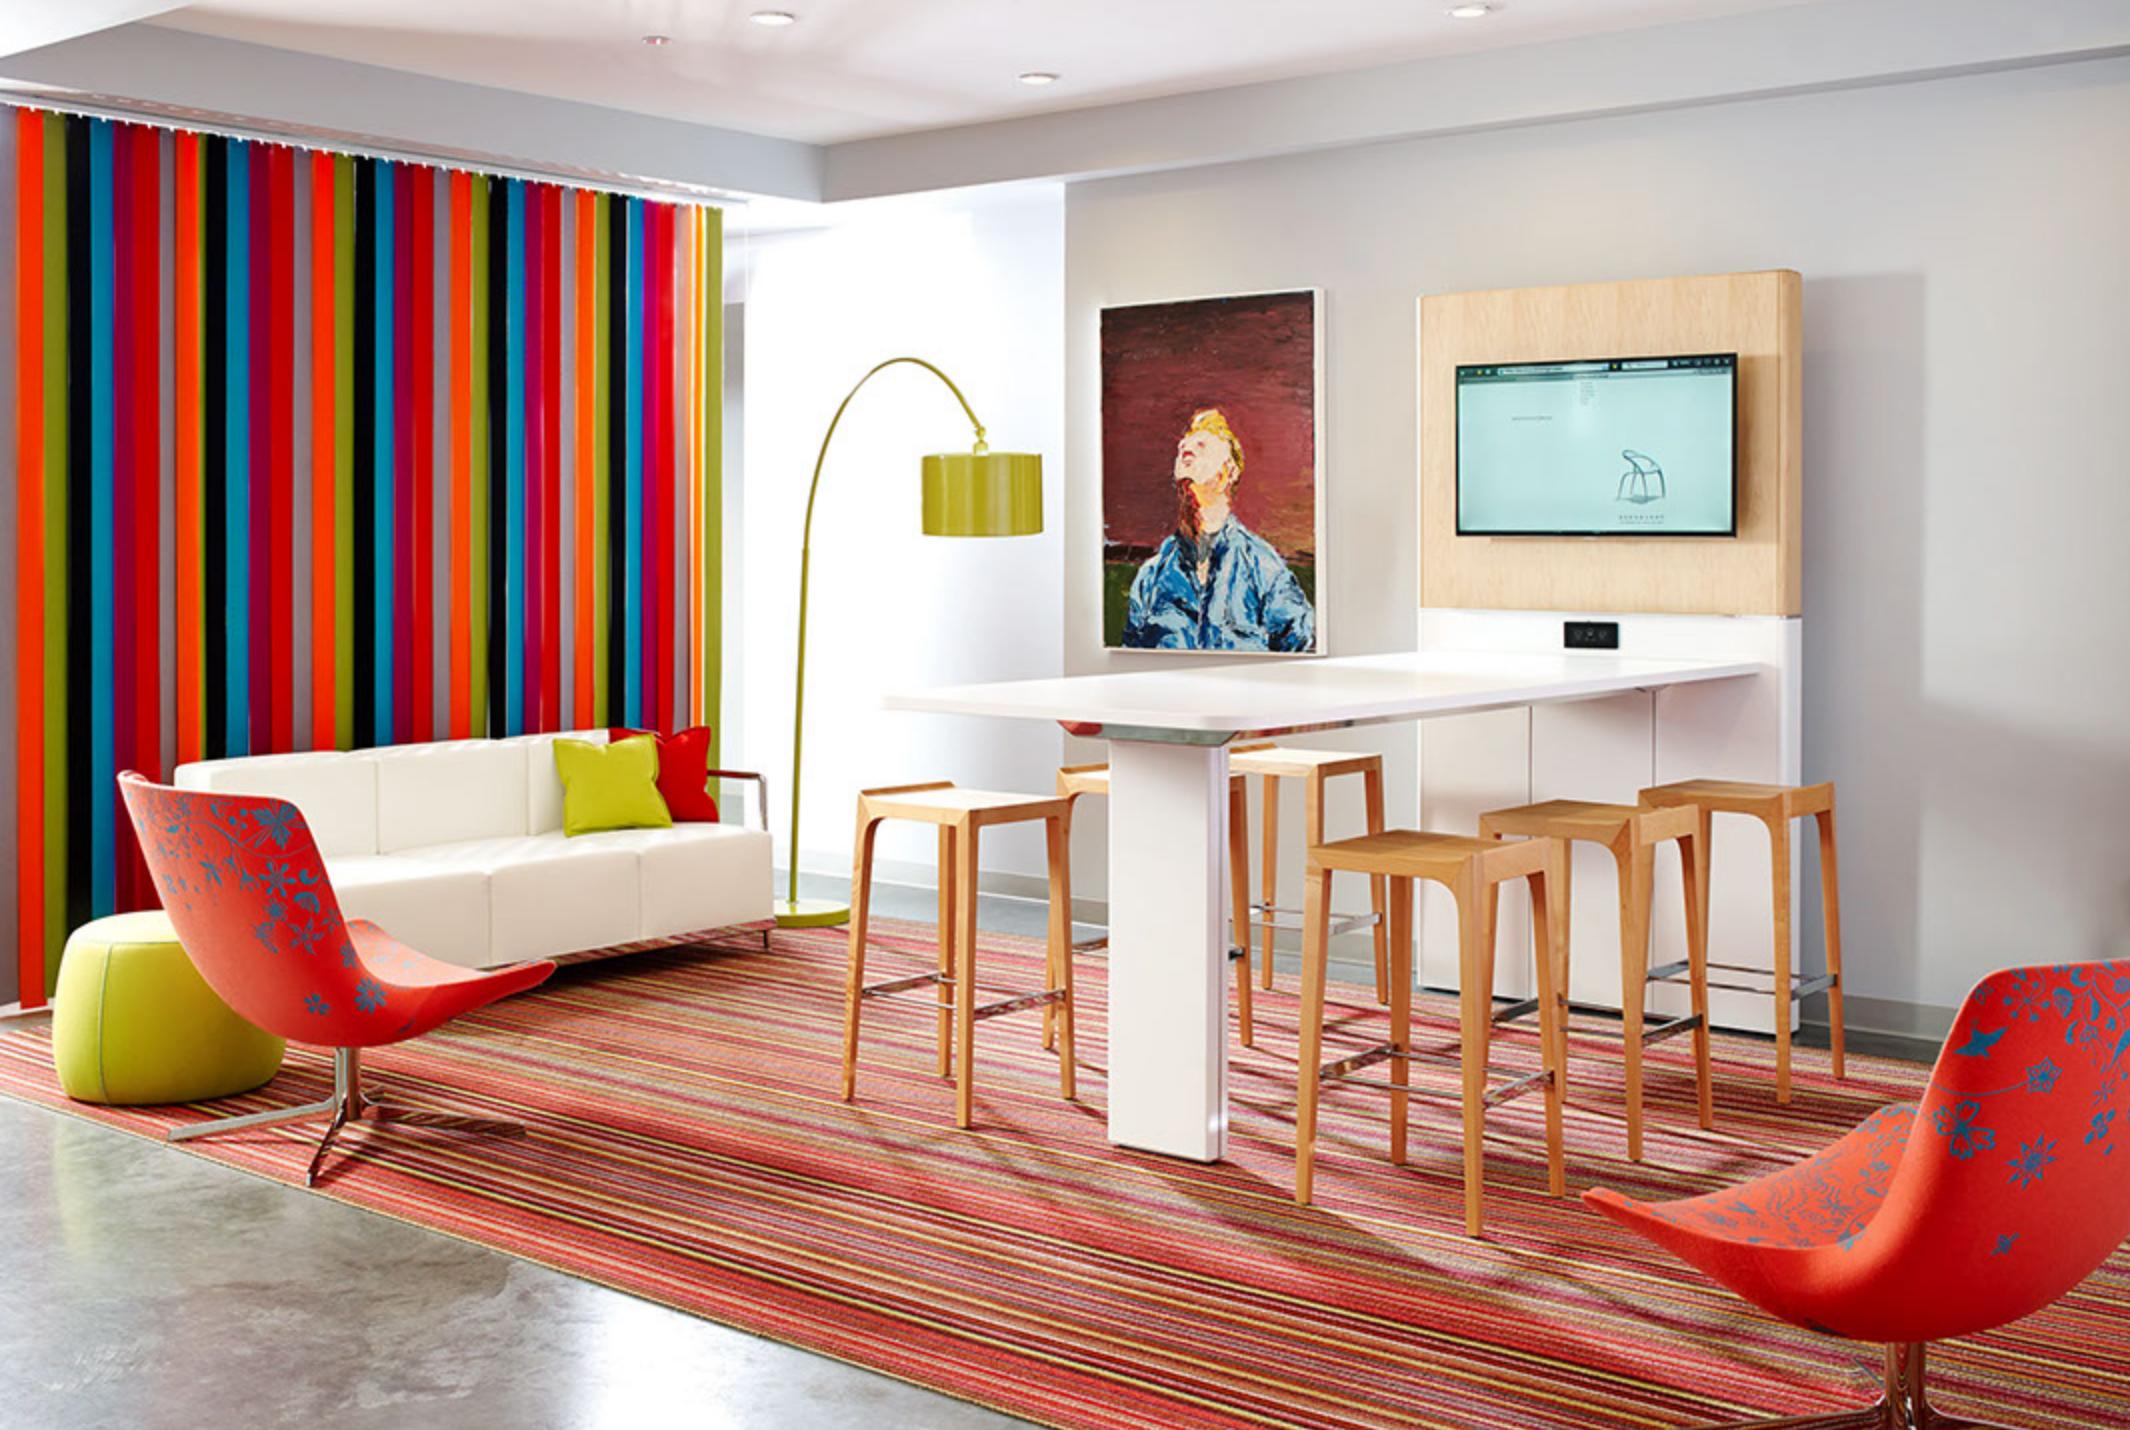 WO_Colorful MTG Room